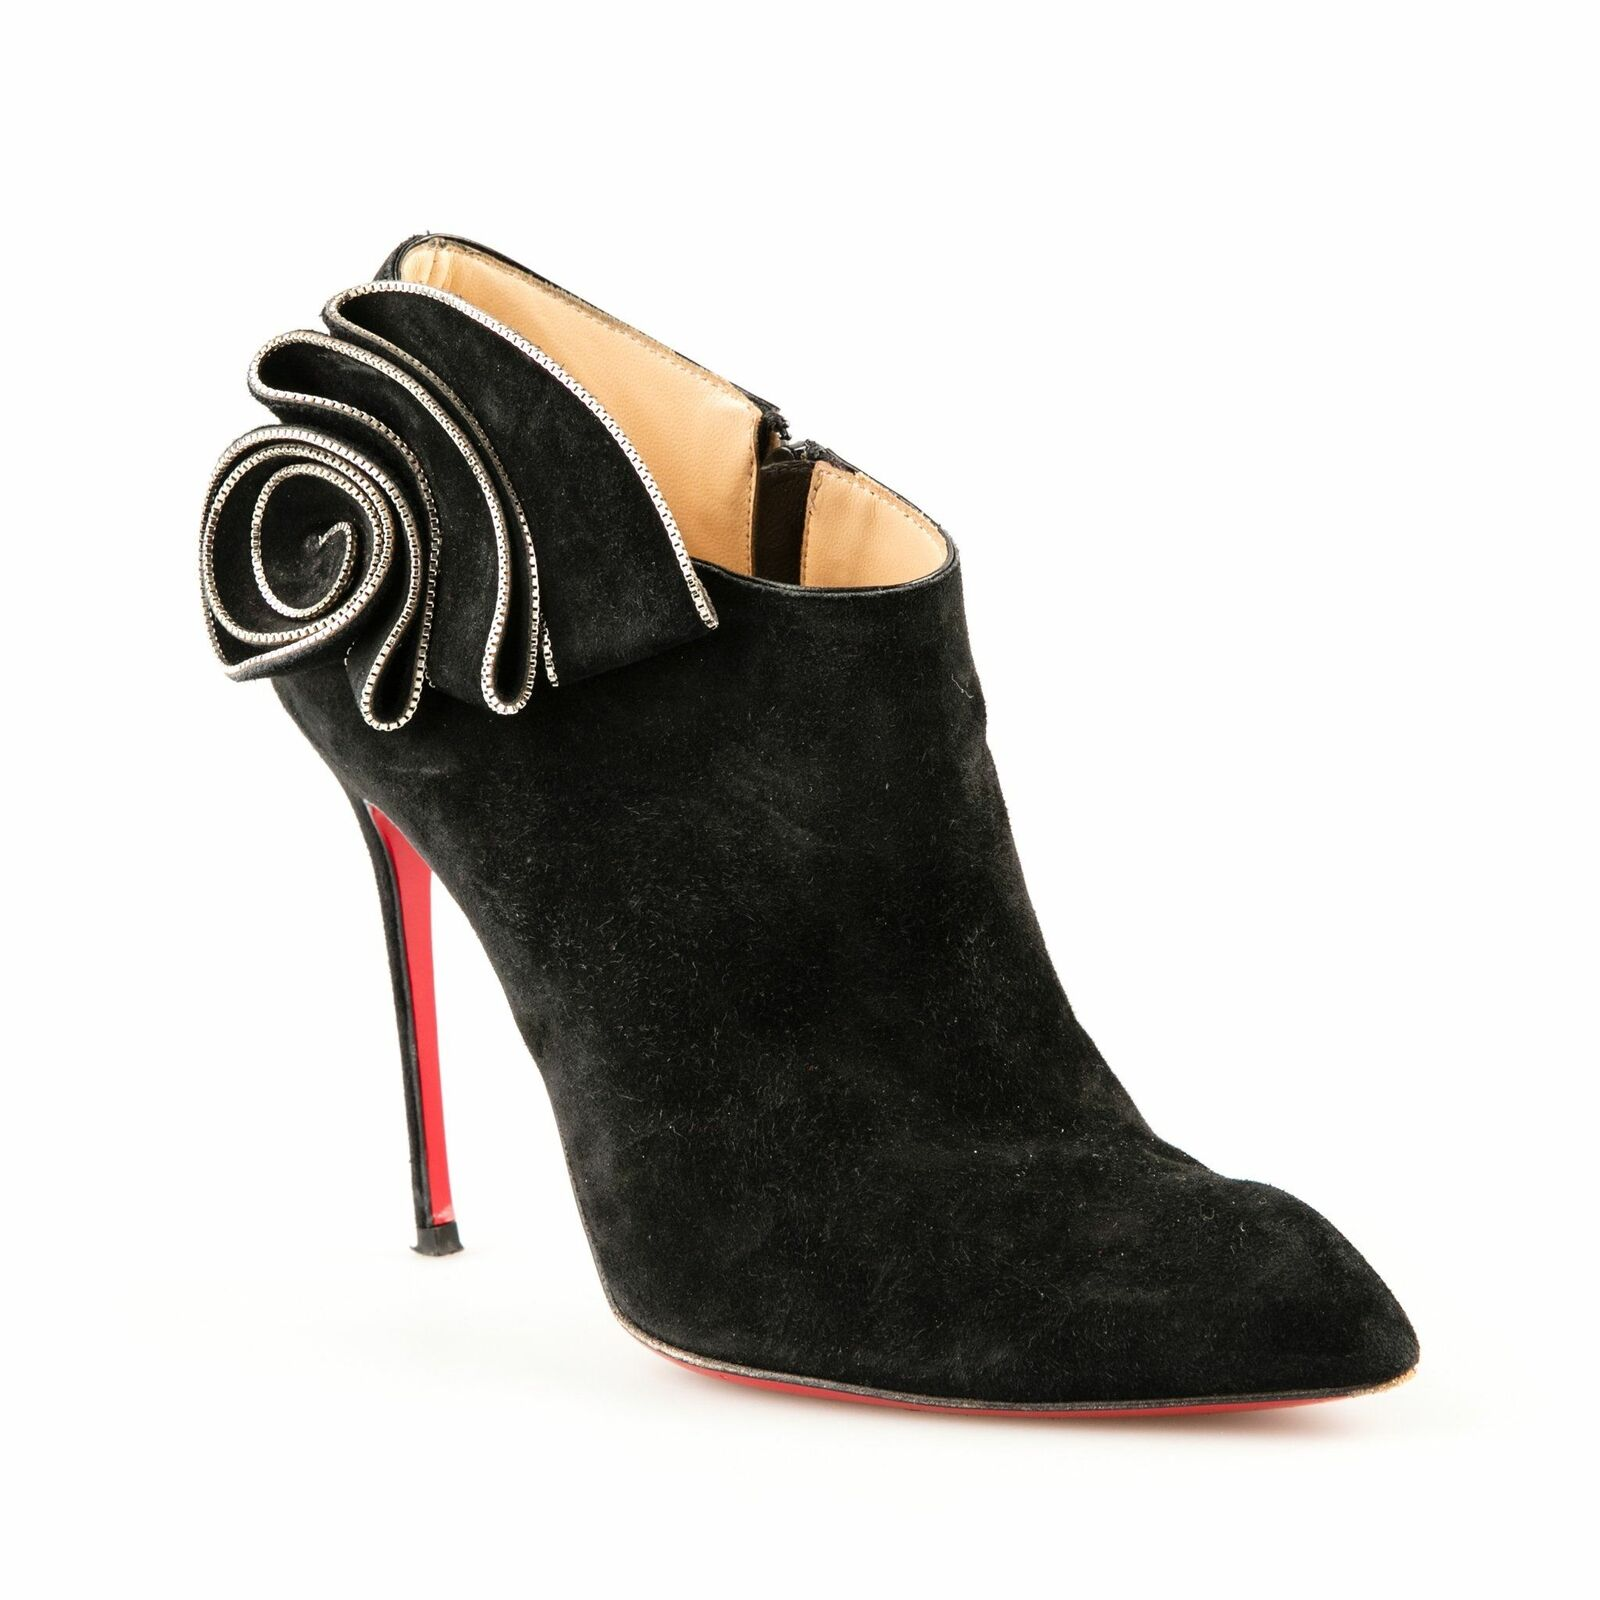 Christian Louboutin 'la señora Baba' Negro Gamuza botas al tobillo-tamaño 38.5